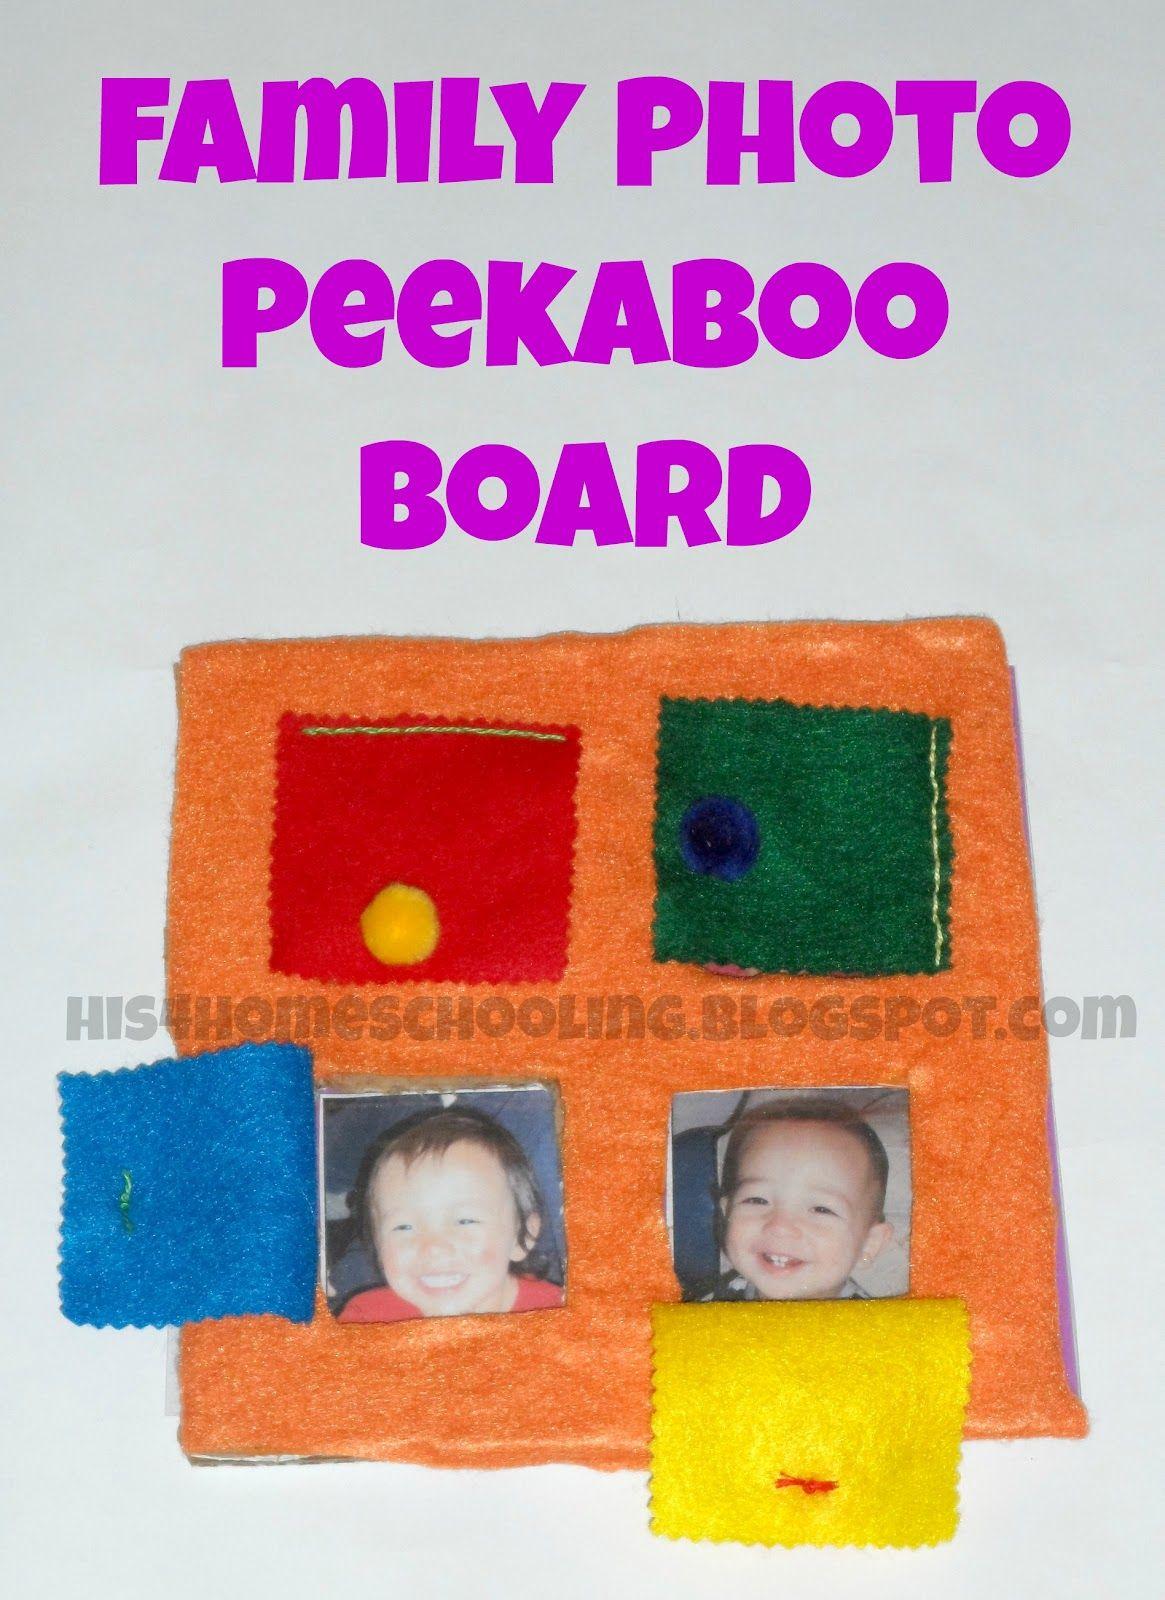 H Is For Homeschooling Family Photo Peekaboo Board